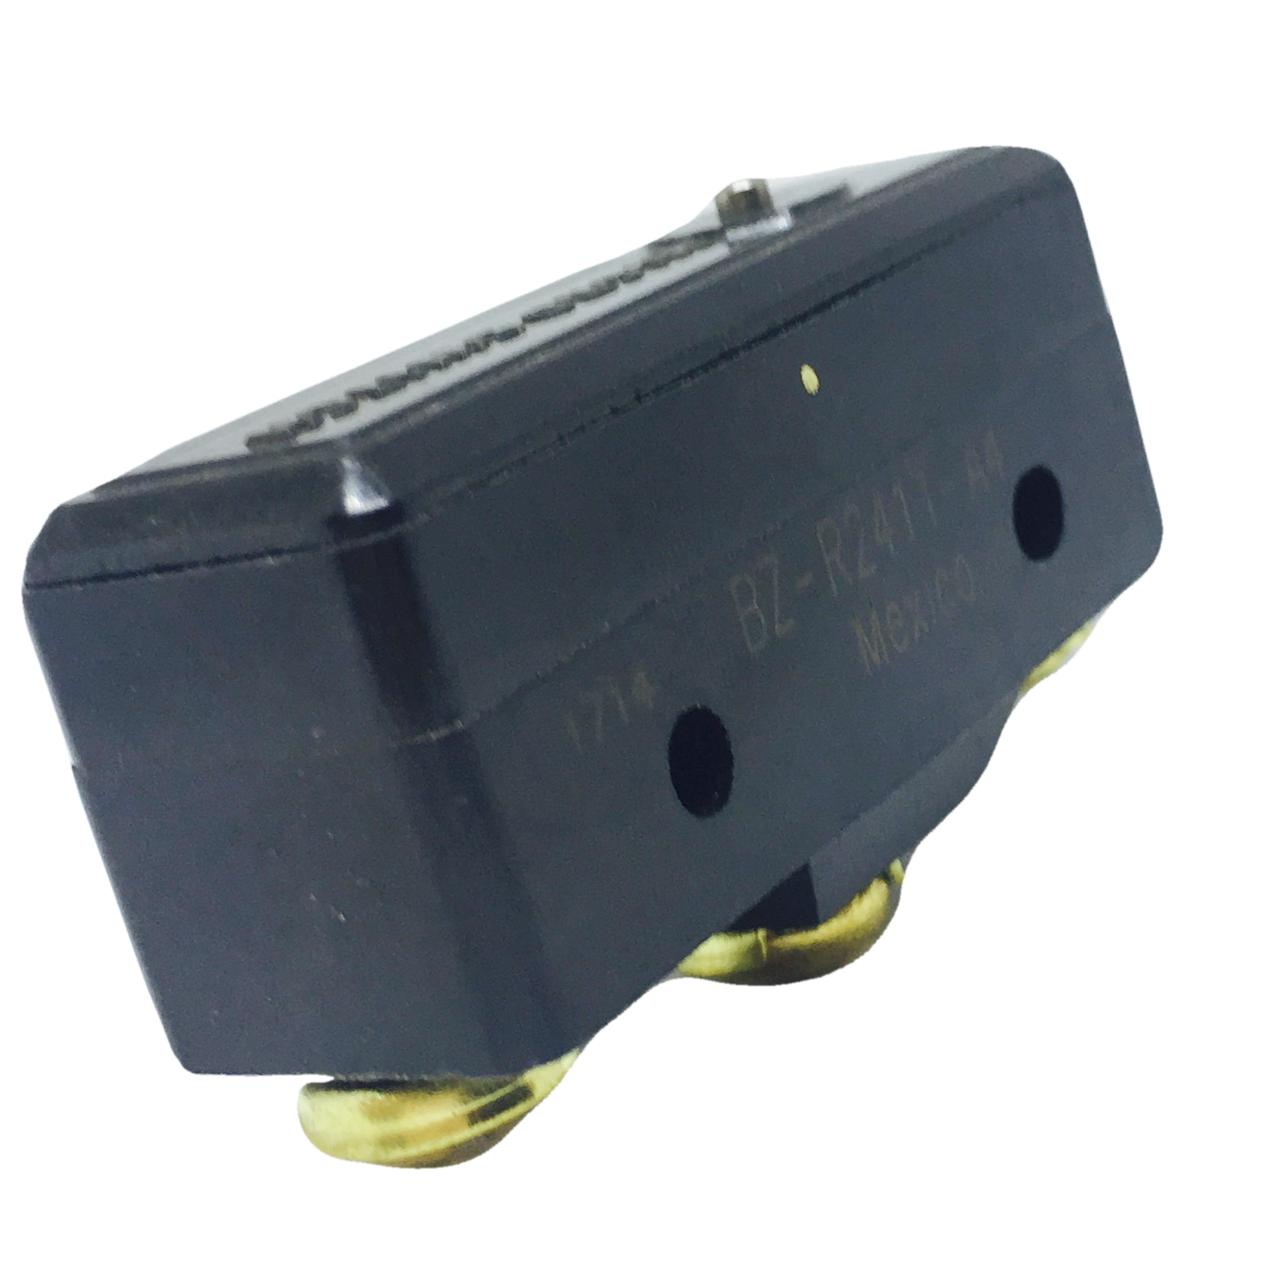 Blue Hose /& Stainless Blue Banjos Pro Braking PBC8013-BLU-BLU Braided Clutch Line